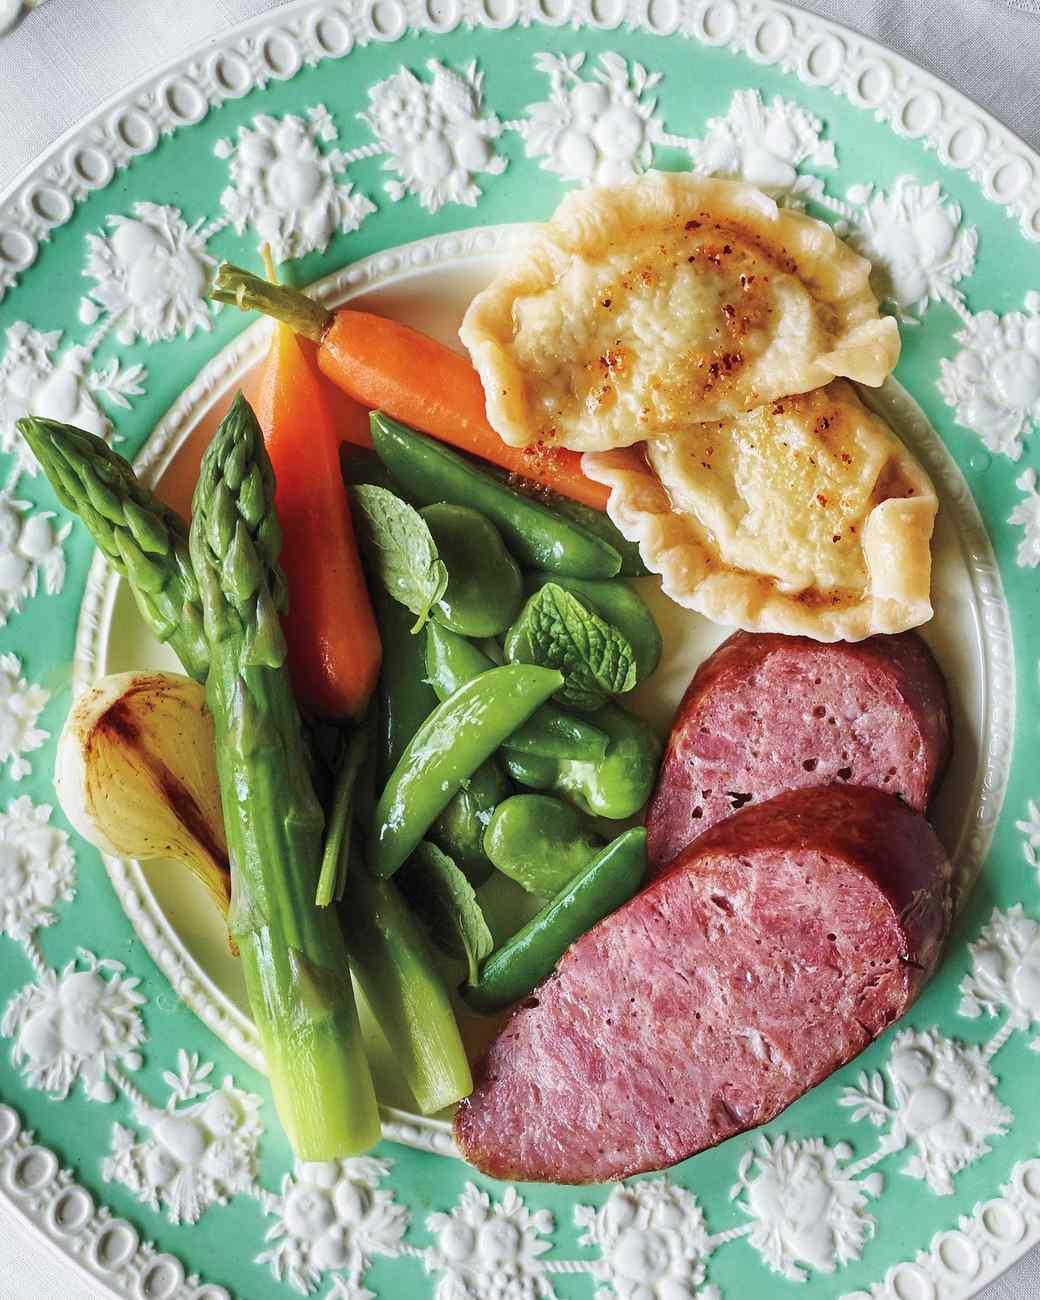 Martha Stewart Easter Dinner Menu  Martha s Easter Menu From Russia with Love